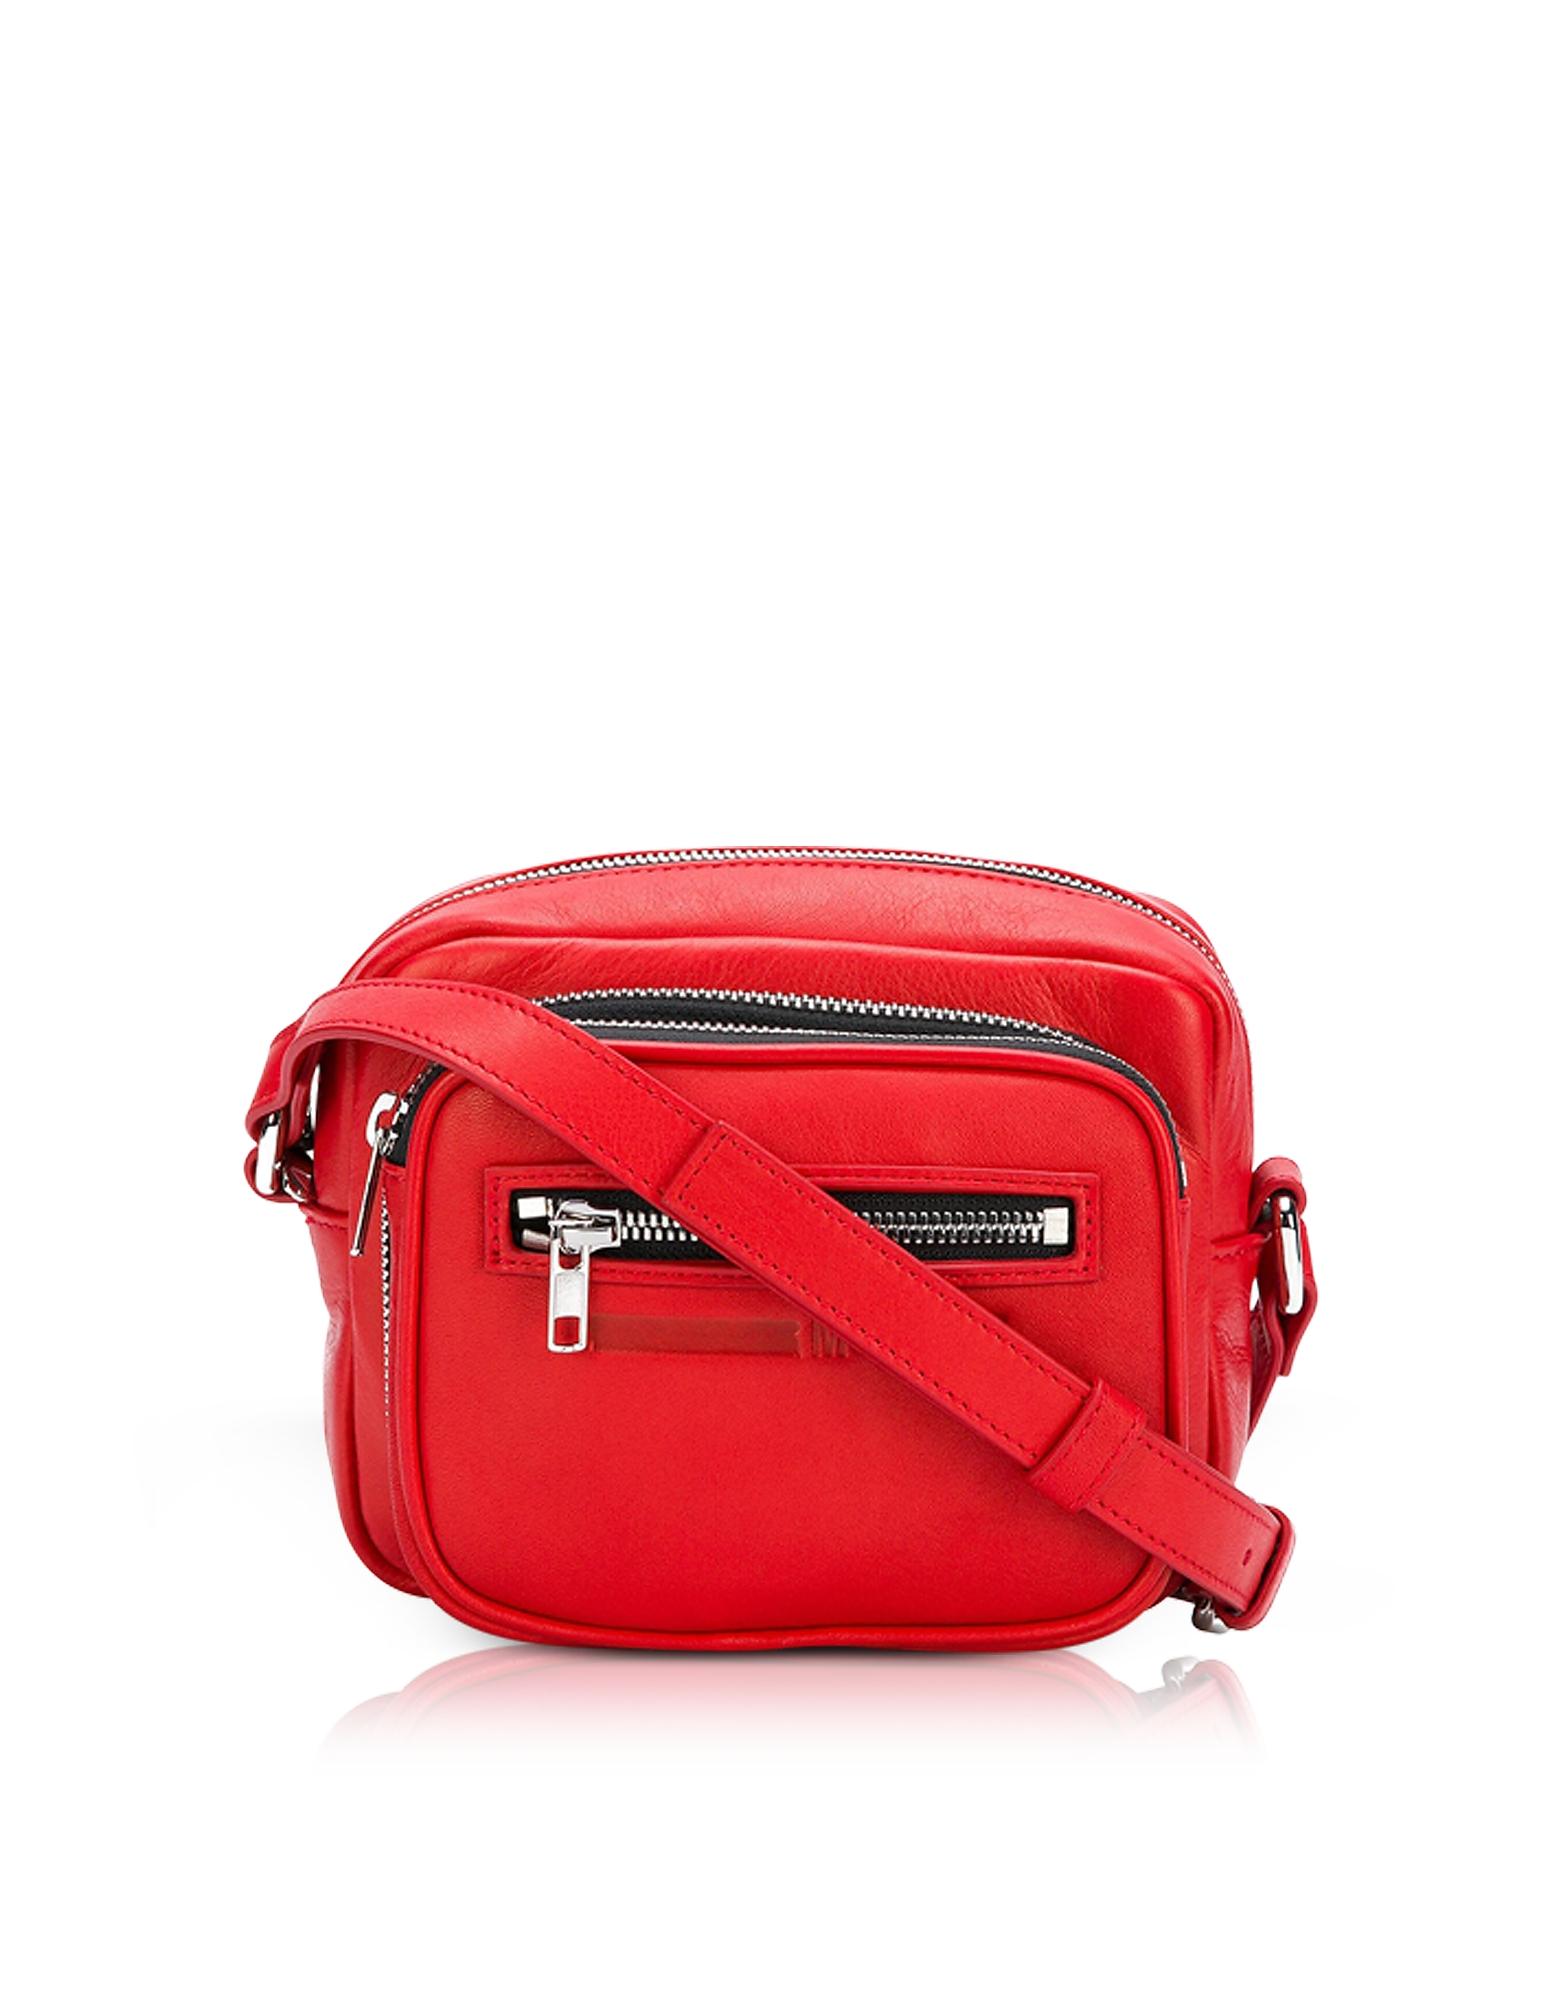 McQ Alexander McQueen Handbags, Loveless Riot Red Leather Crossbody Camera Bag